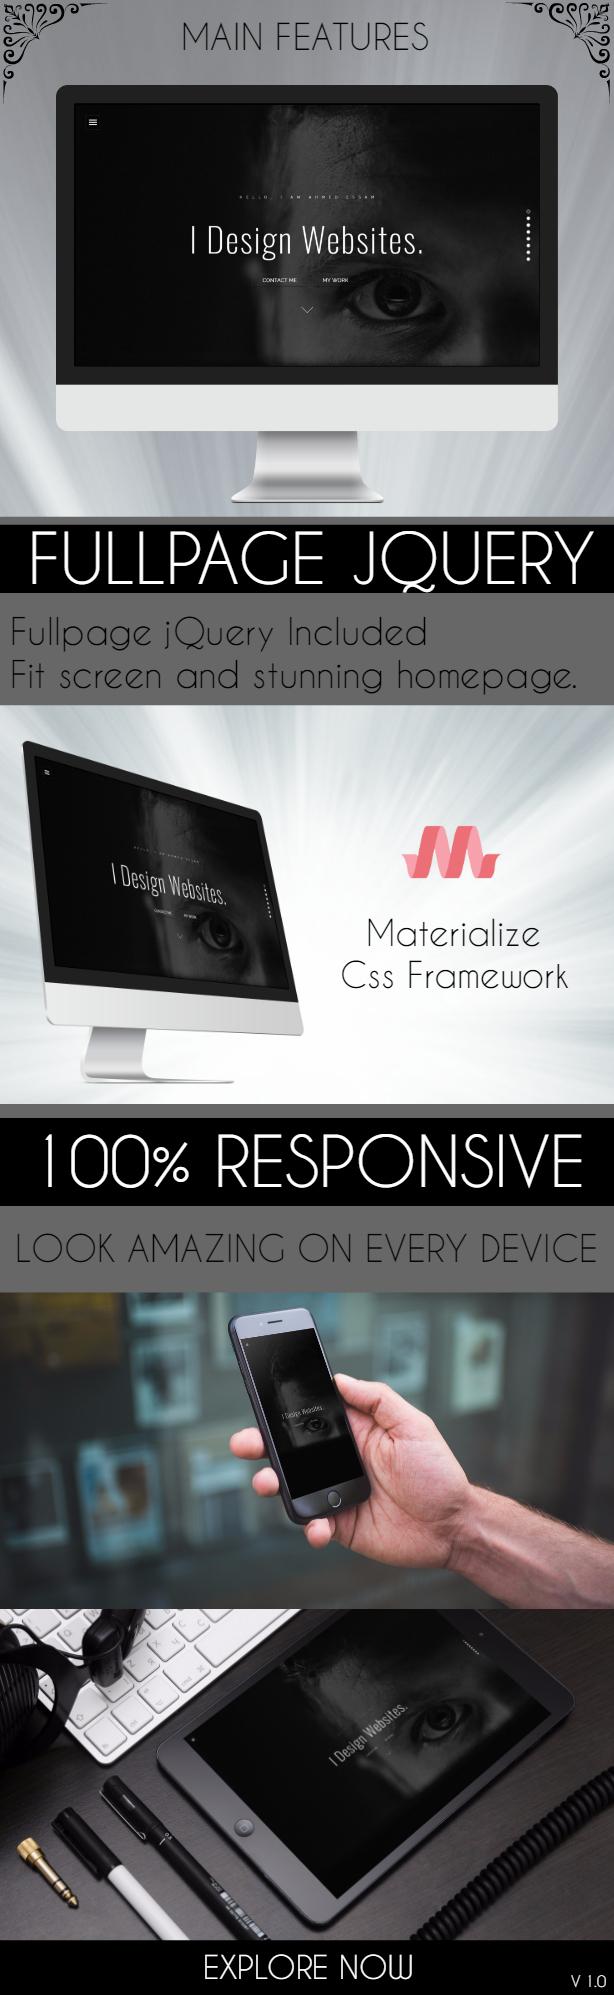 Eye-Look Personal Portfolio HTML5 Template - 1